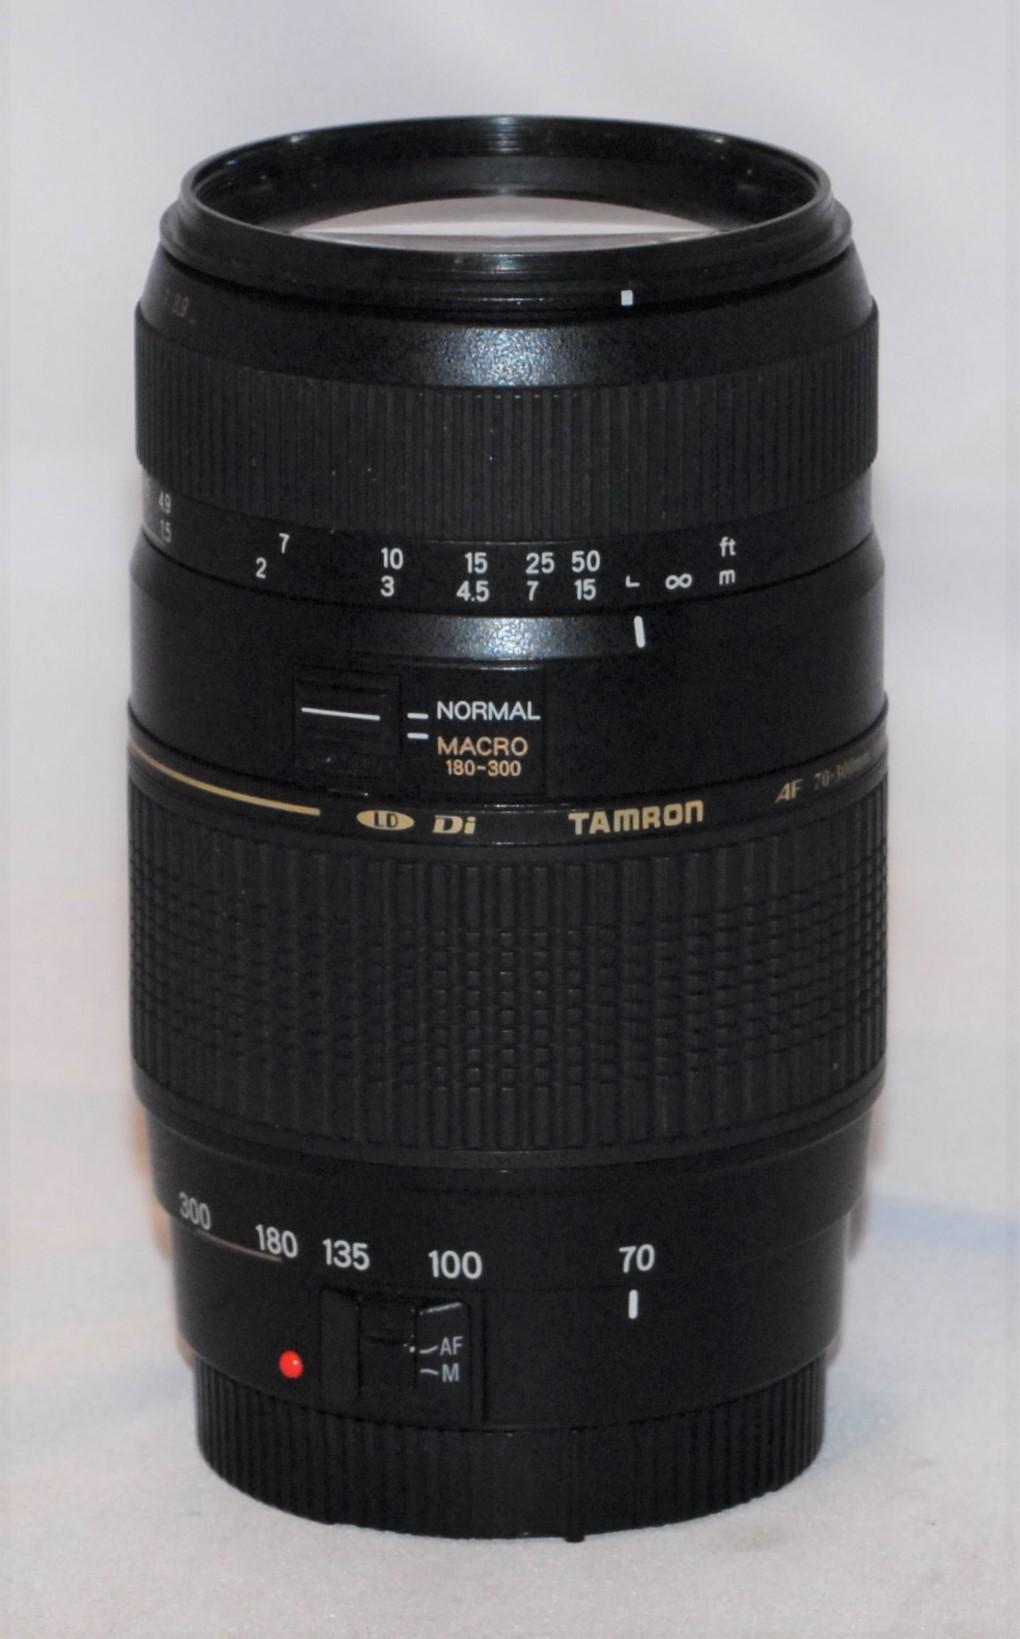 Tamron 70-300mm LD Di Macro